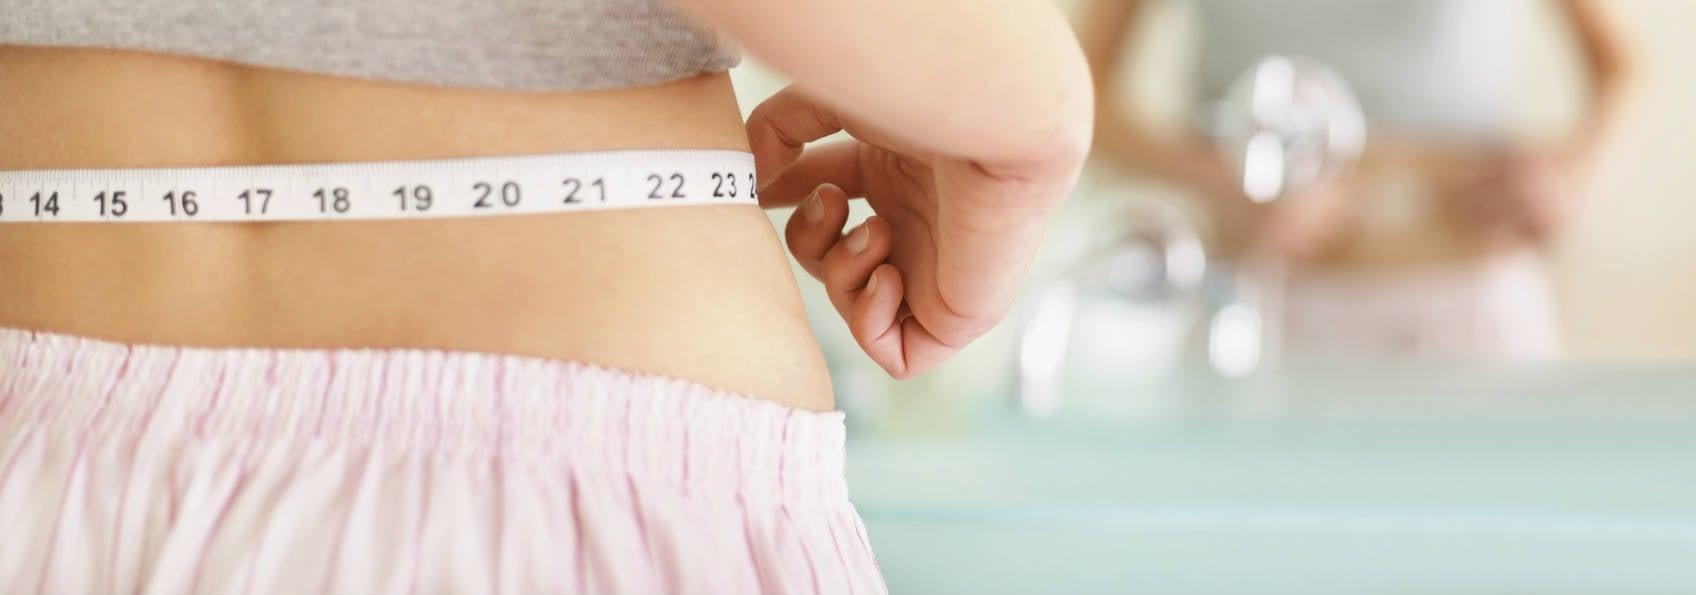 Treadmill Lose Weight Fast